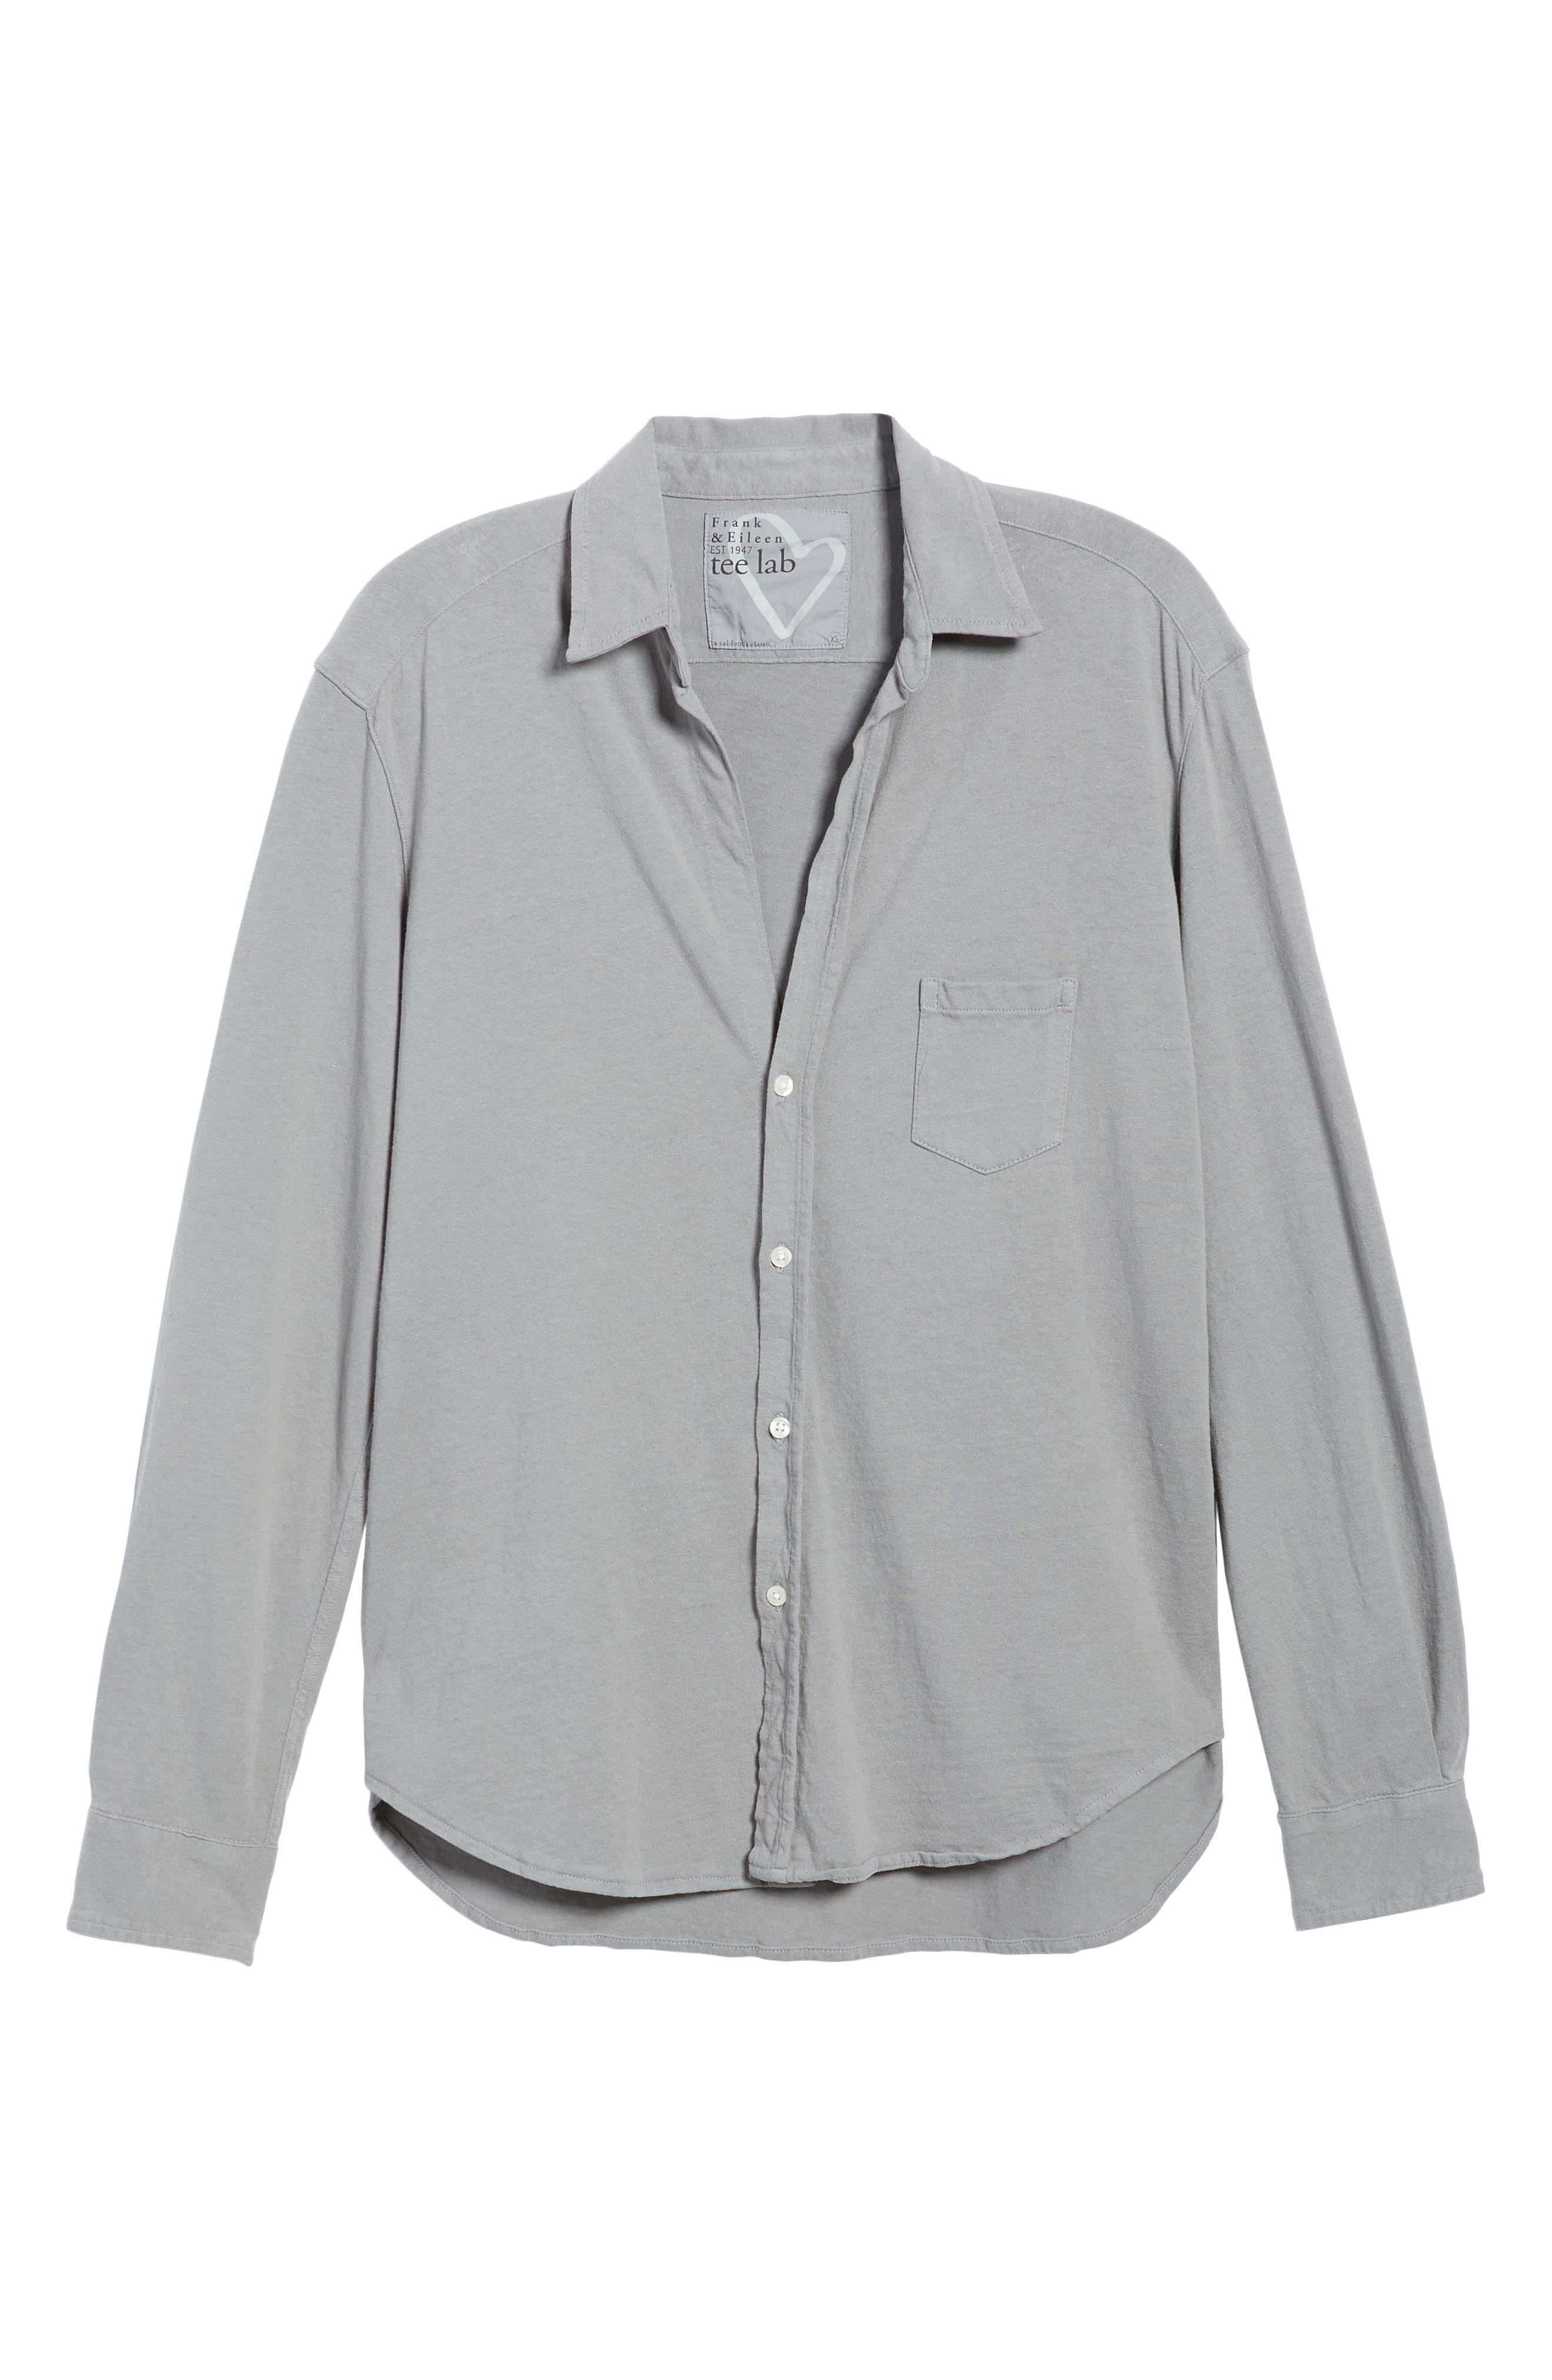 Tee Lab Knit Button Down Shirt,                             Alternate thumbnail 6, color,                             Shadow